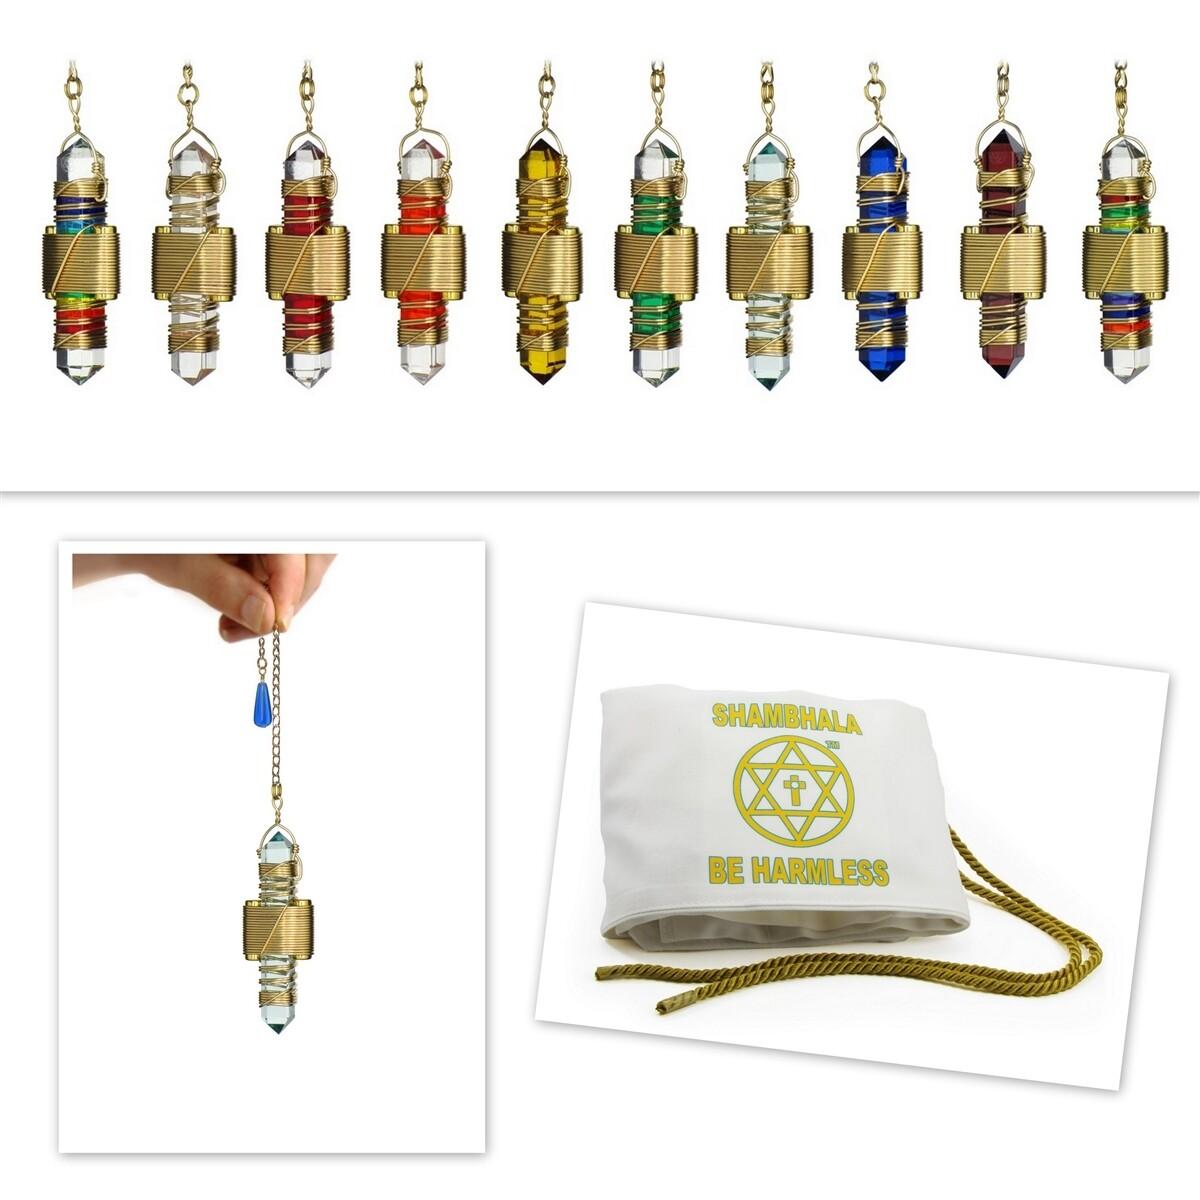 "Buddha Maitreya the Christ 2.5"" Etheric Weaver - 10 Set in Gold"